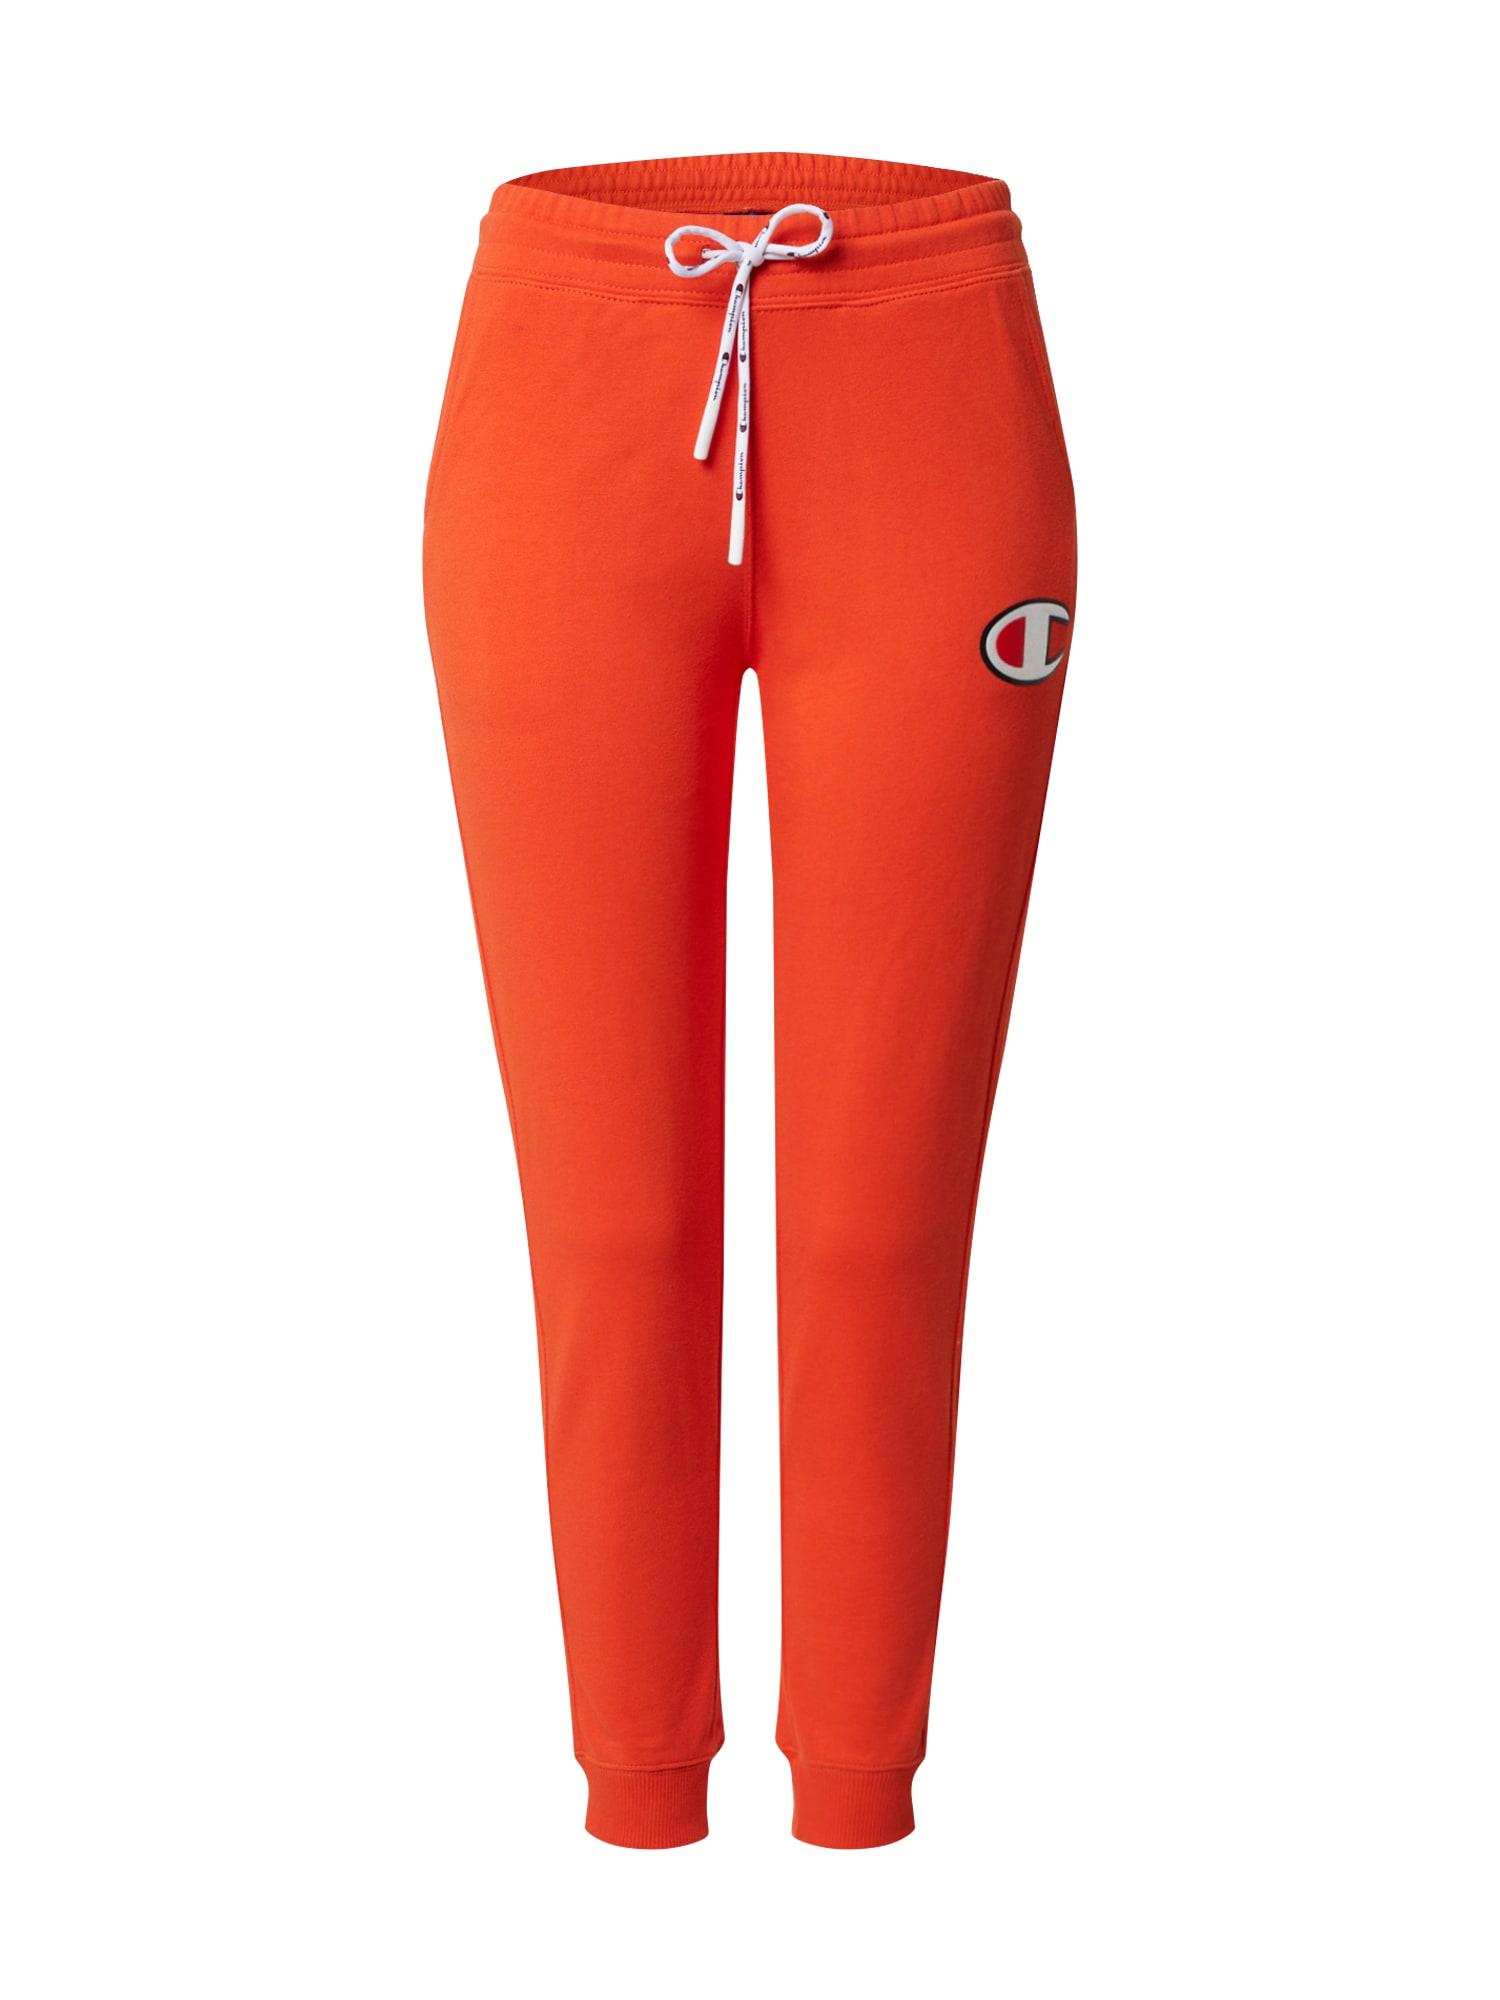 Champion Authentic Athletic Apparel Kelnės 'Rib Cuff Pants' raudona